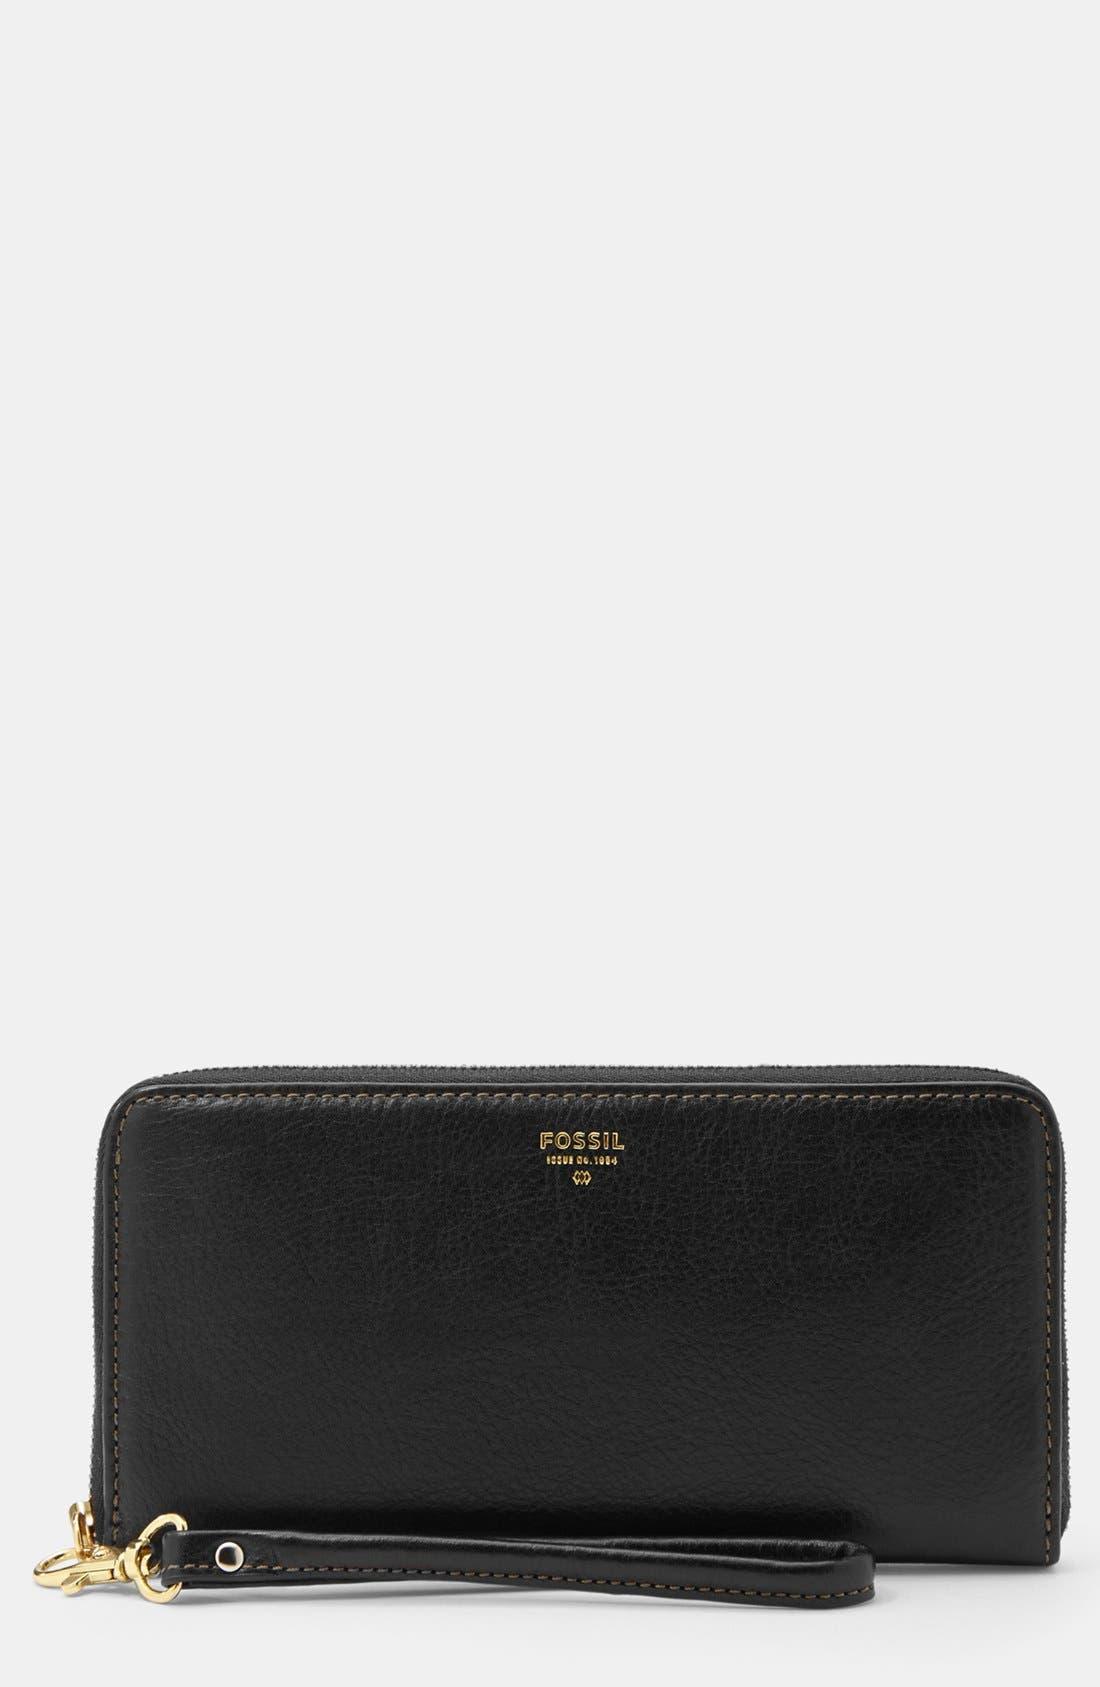 FOSSIL, 'Sydney' Zip Clutch Wallet, Main thumbnail 1, color, 001